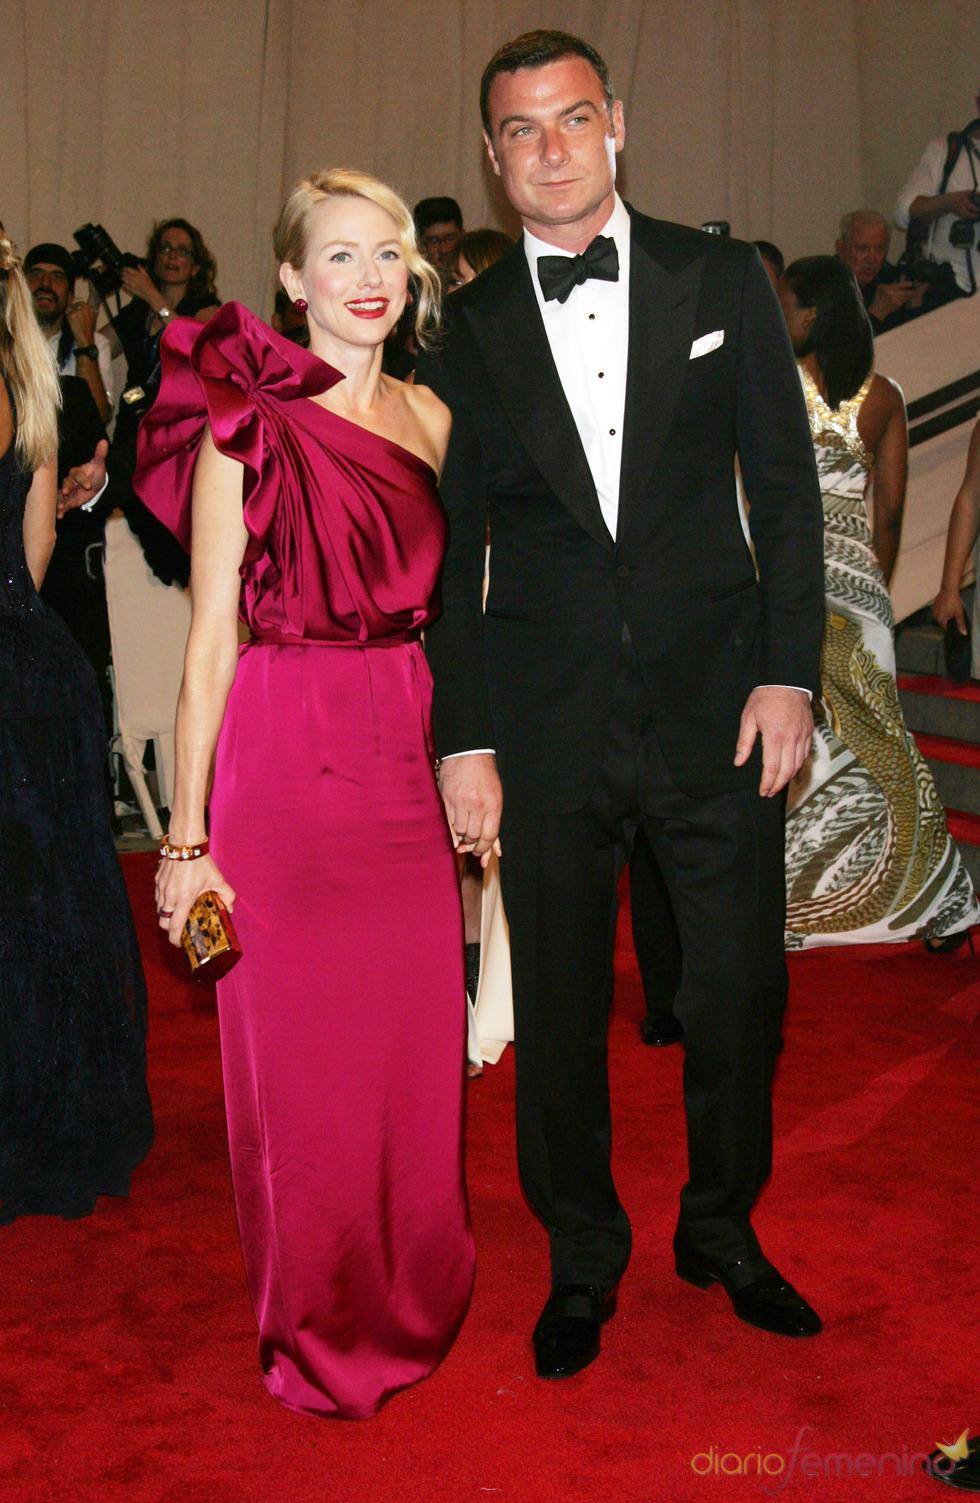 Naomi Watts y Liev Schreiber en la gala del Costume Institute